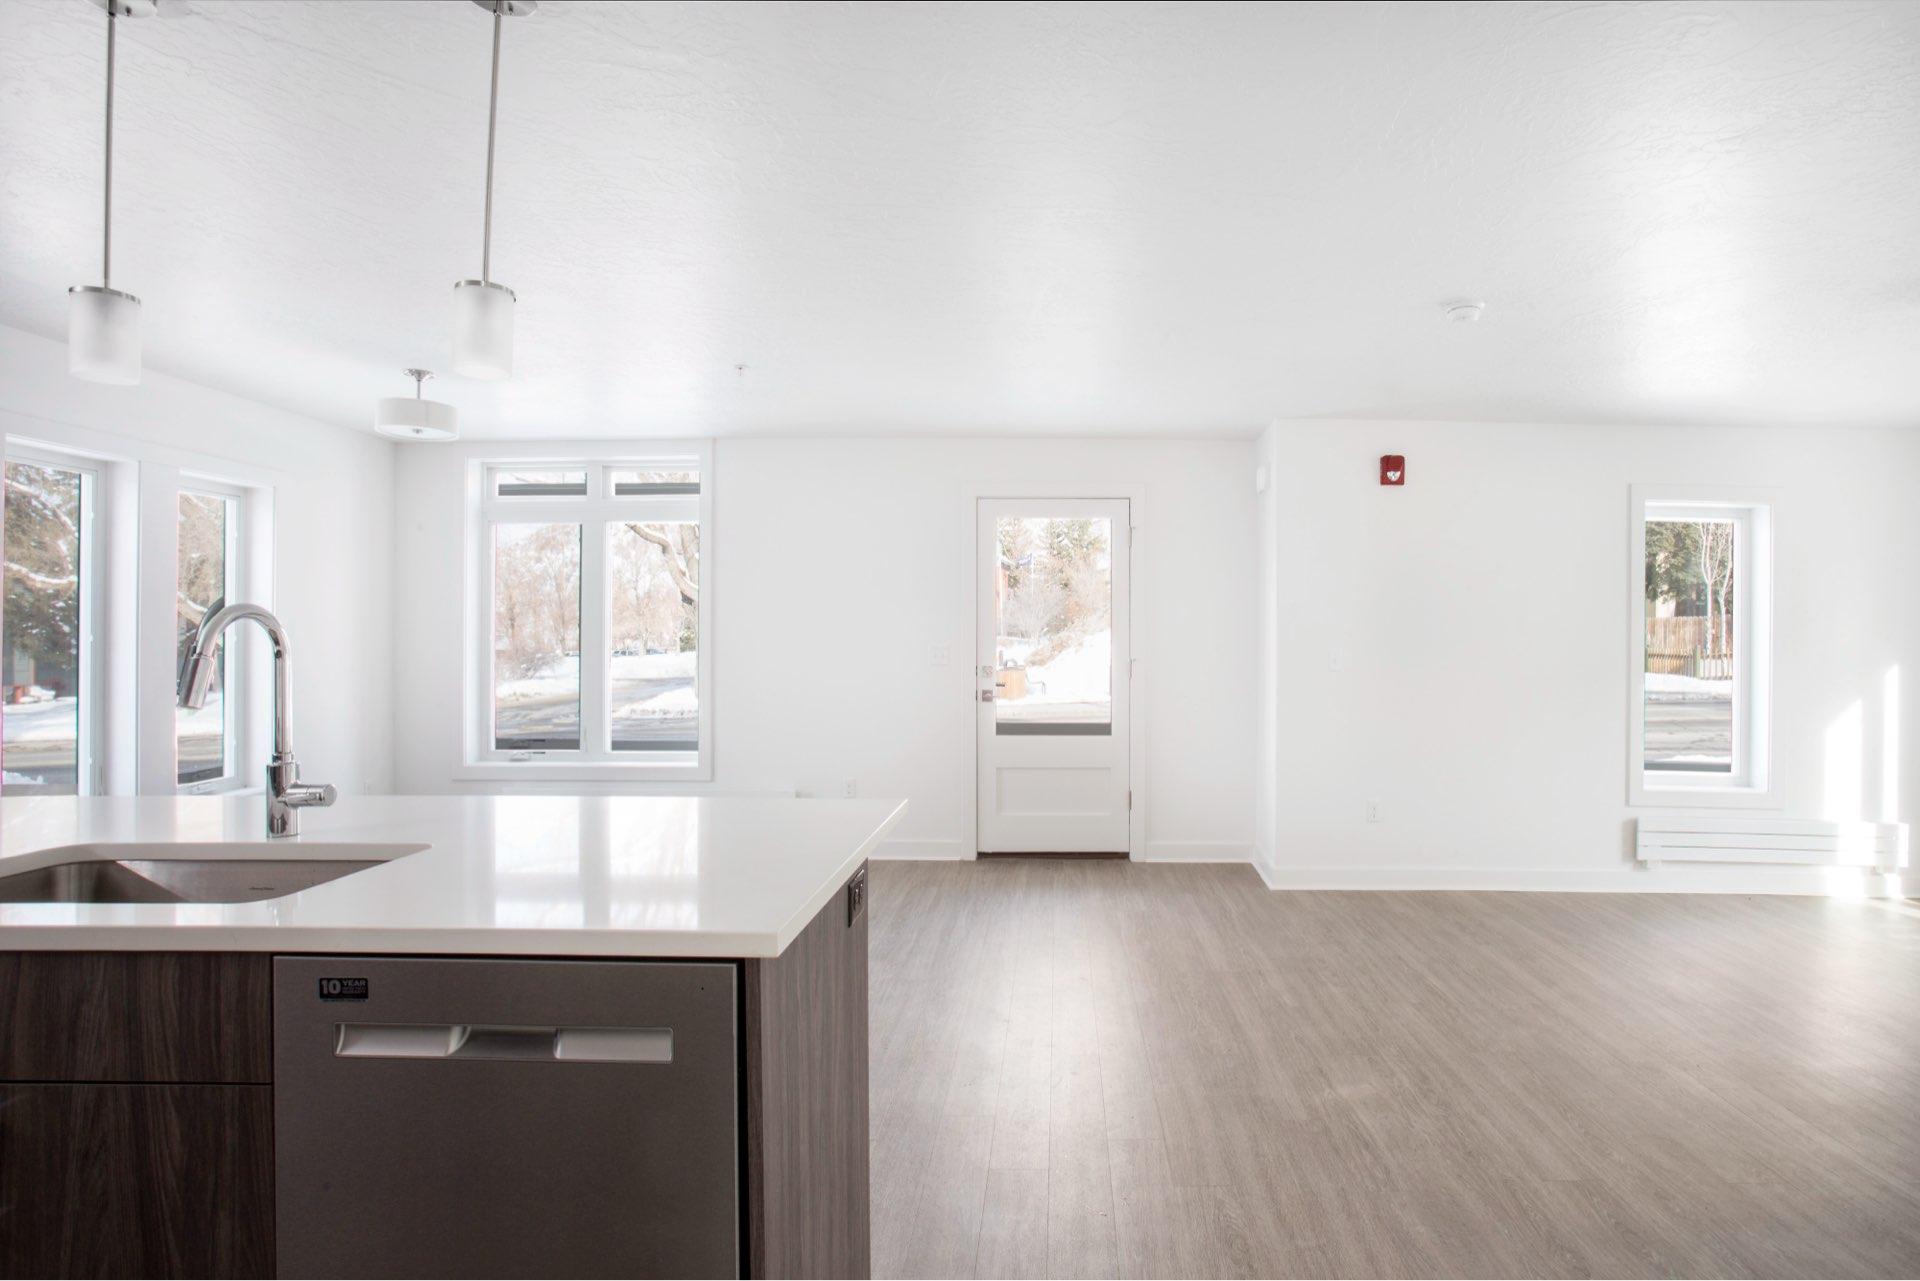 Interior, Woodside Park Affordable Housing, architectural design by Elliott Workgroup